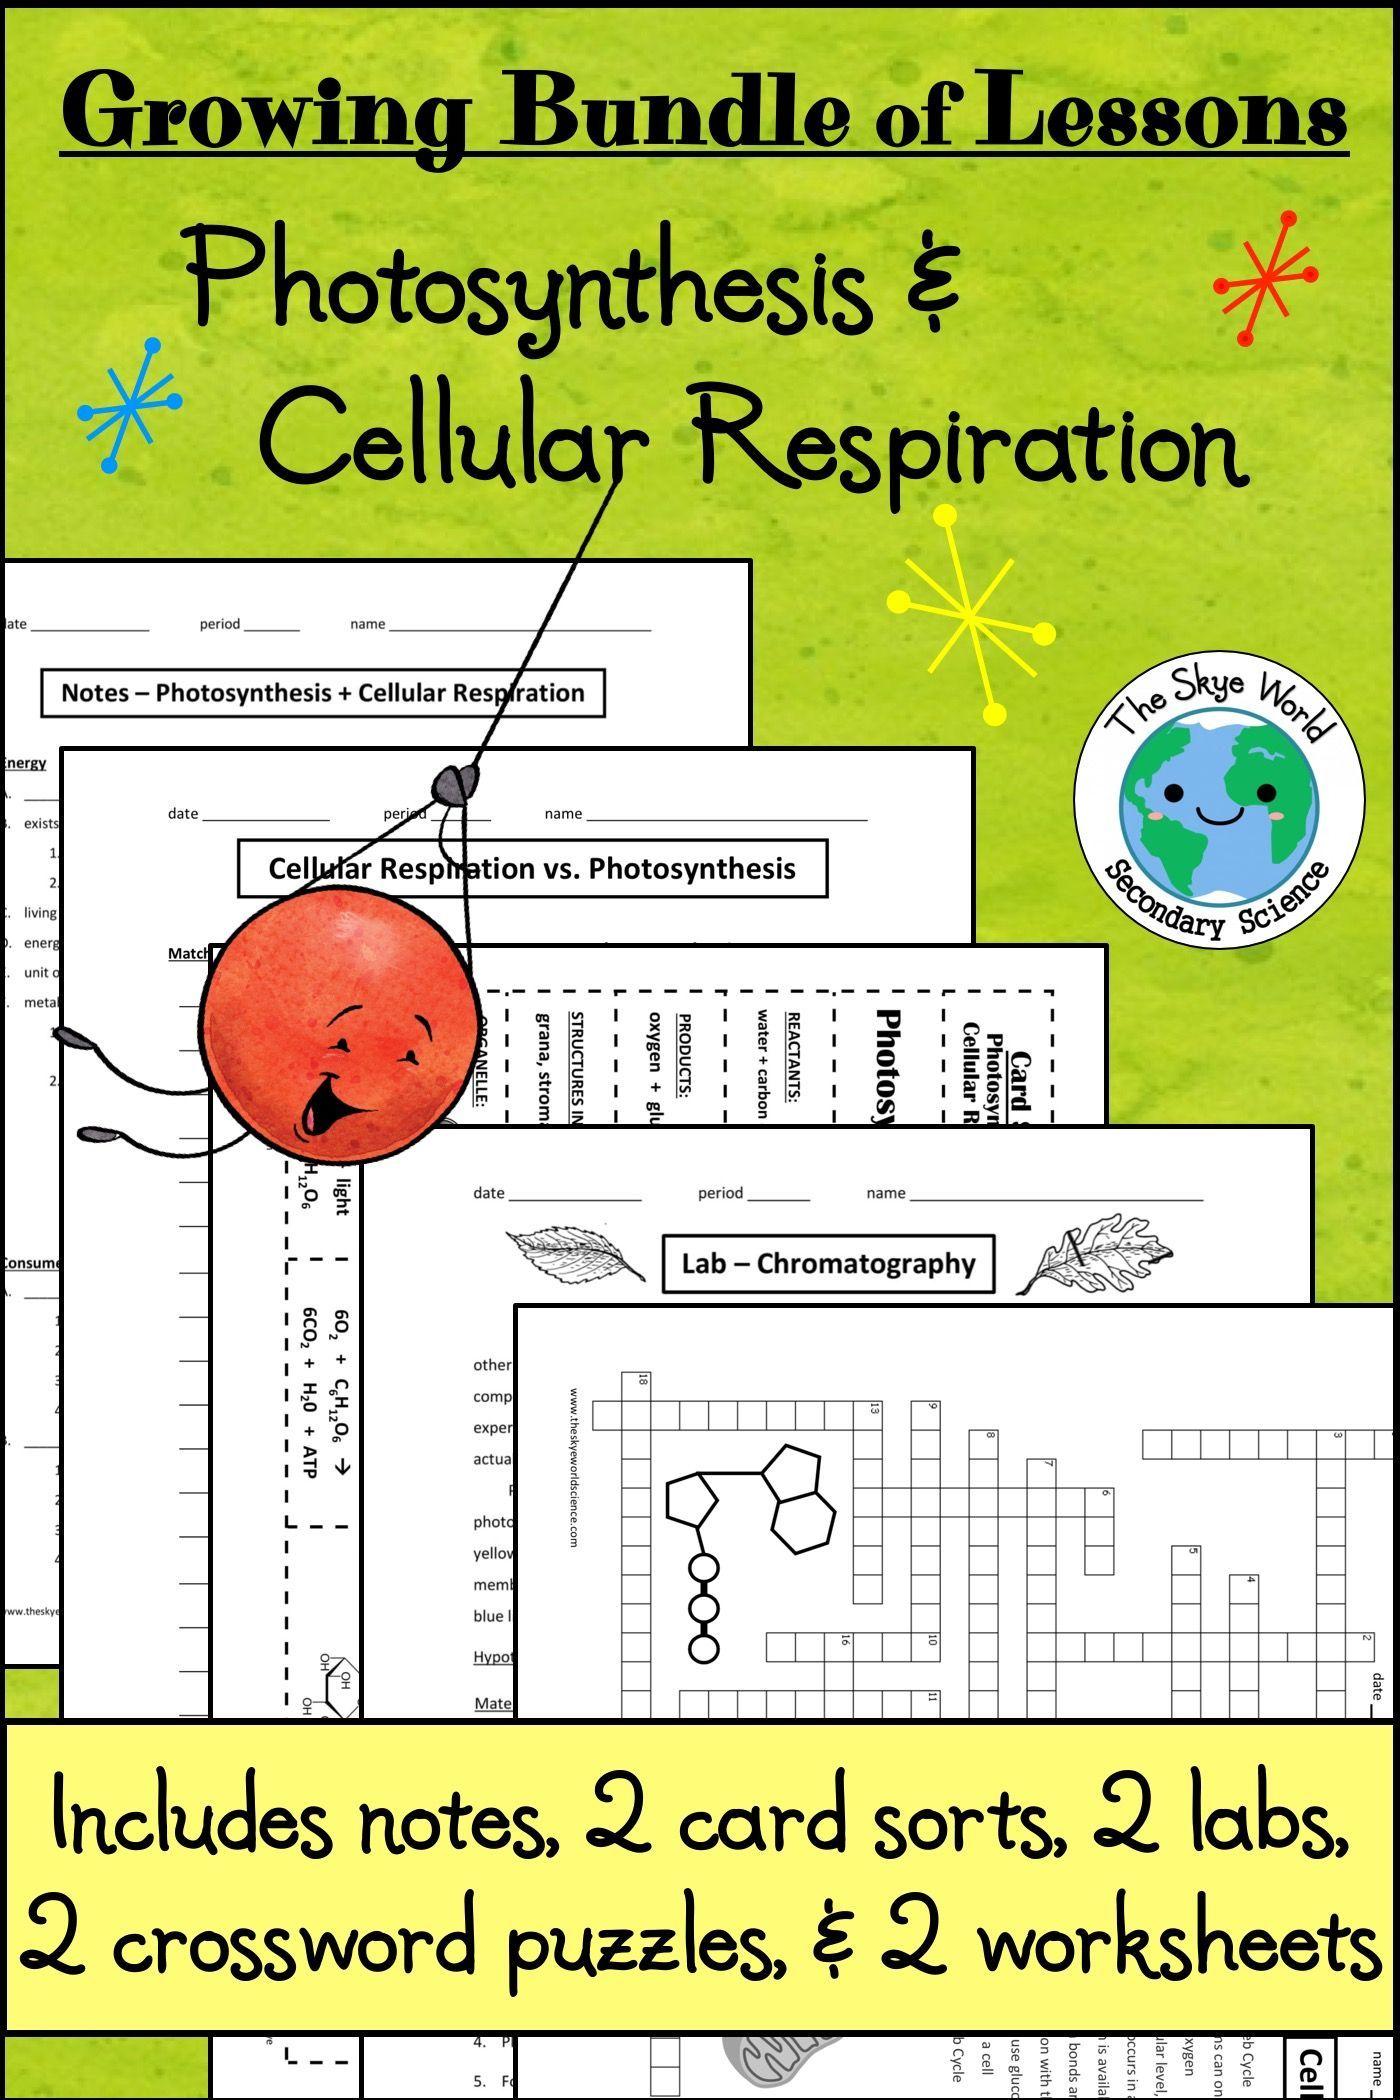 Cellular Respiration Steps Inputs And Outputs Idalias Salon